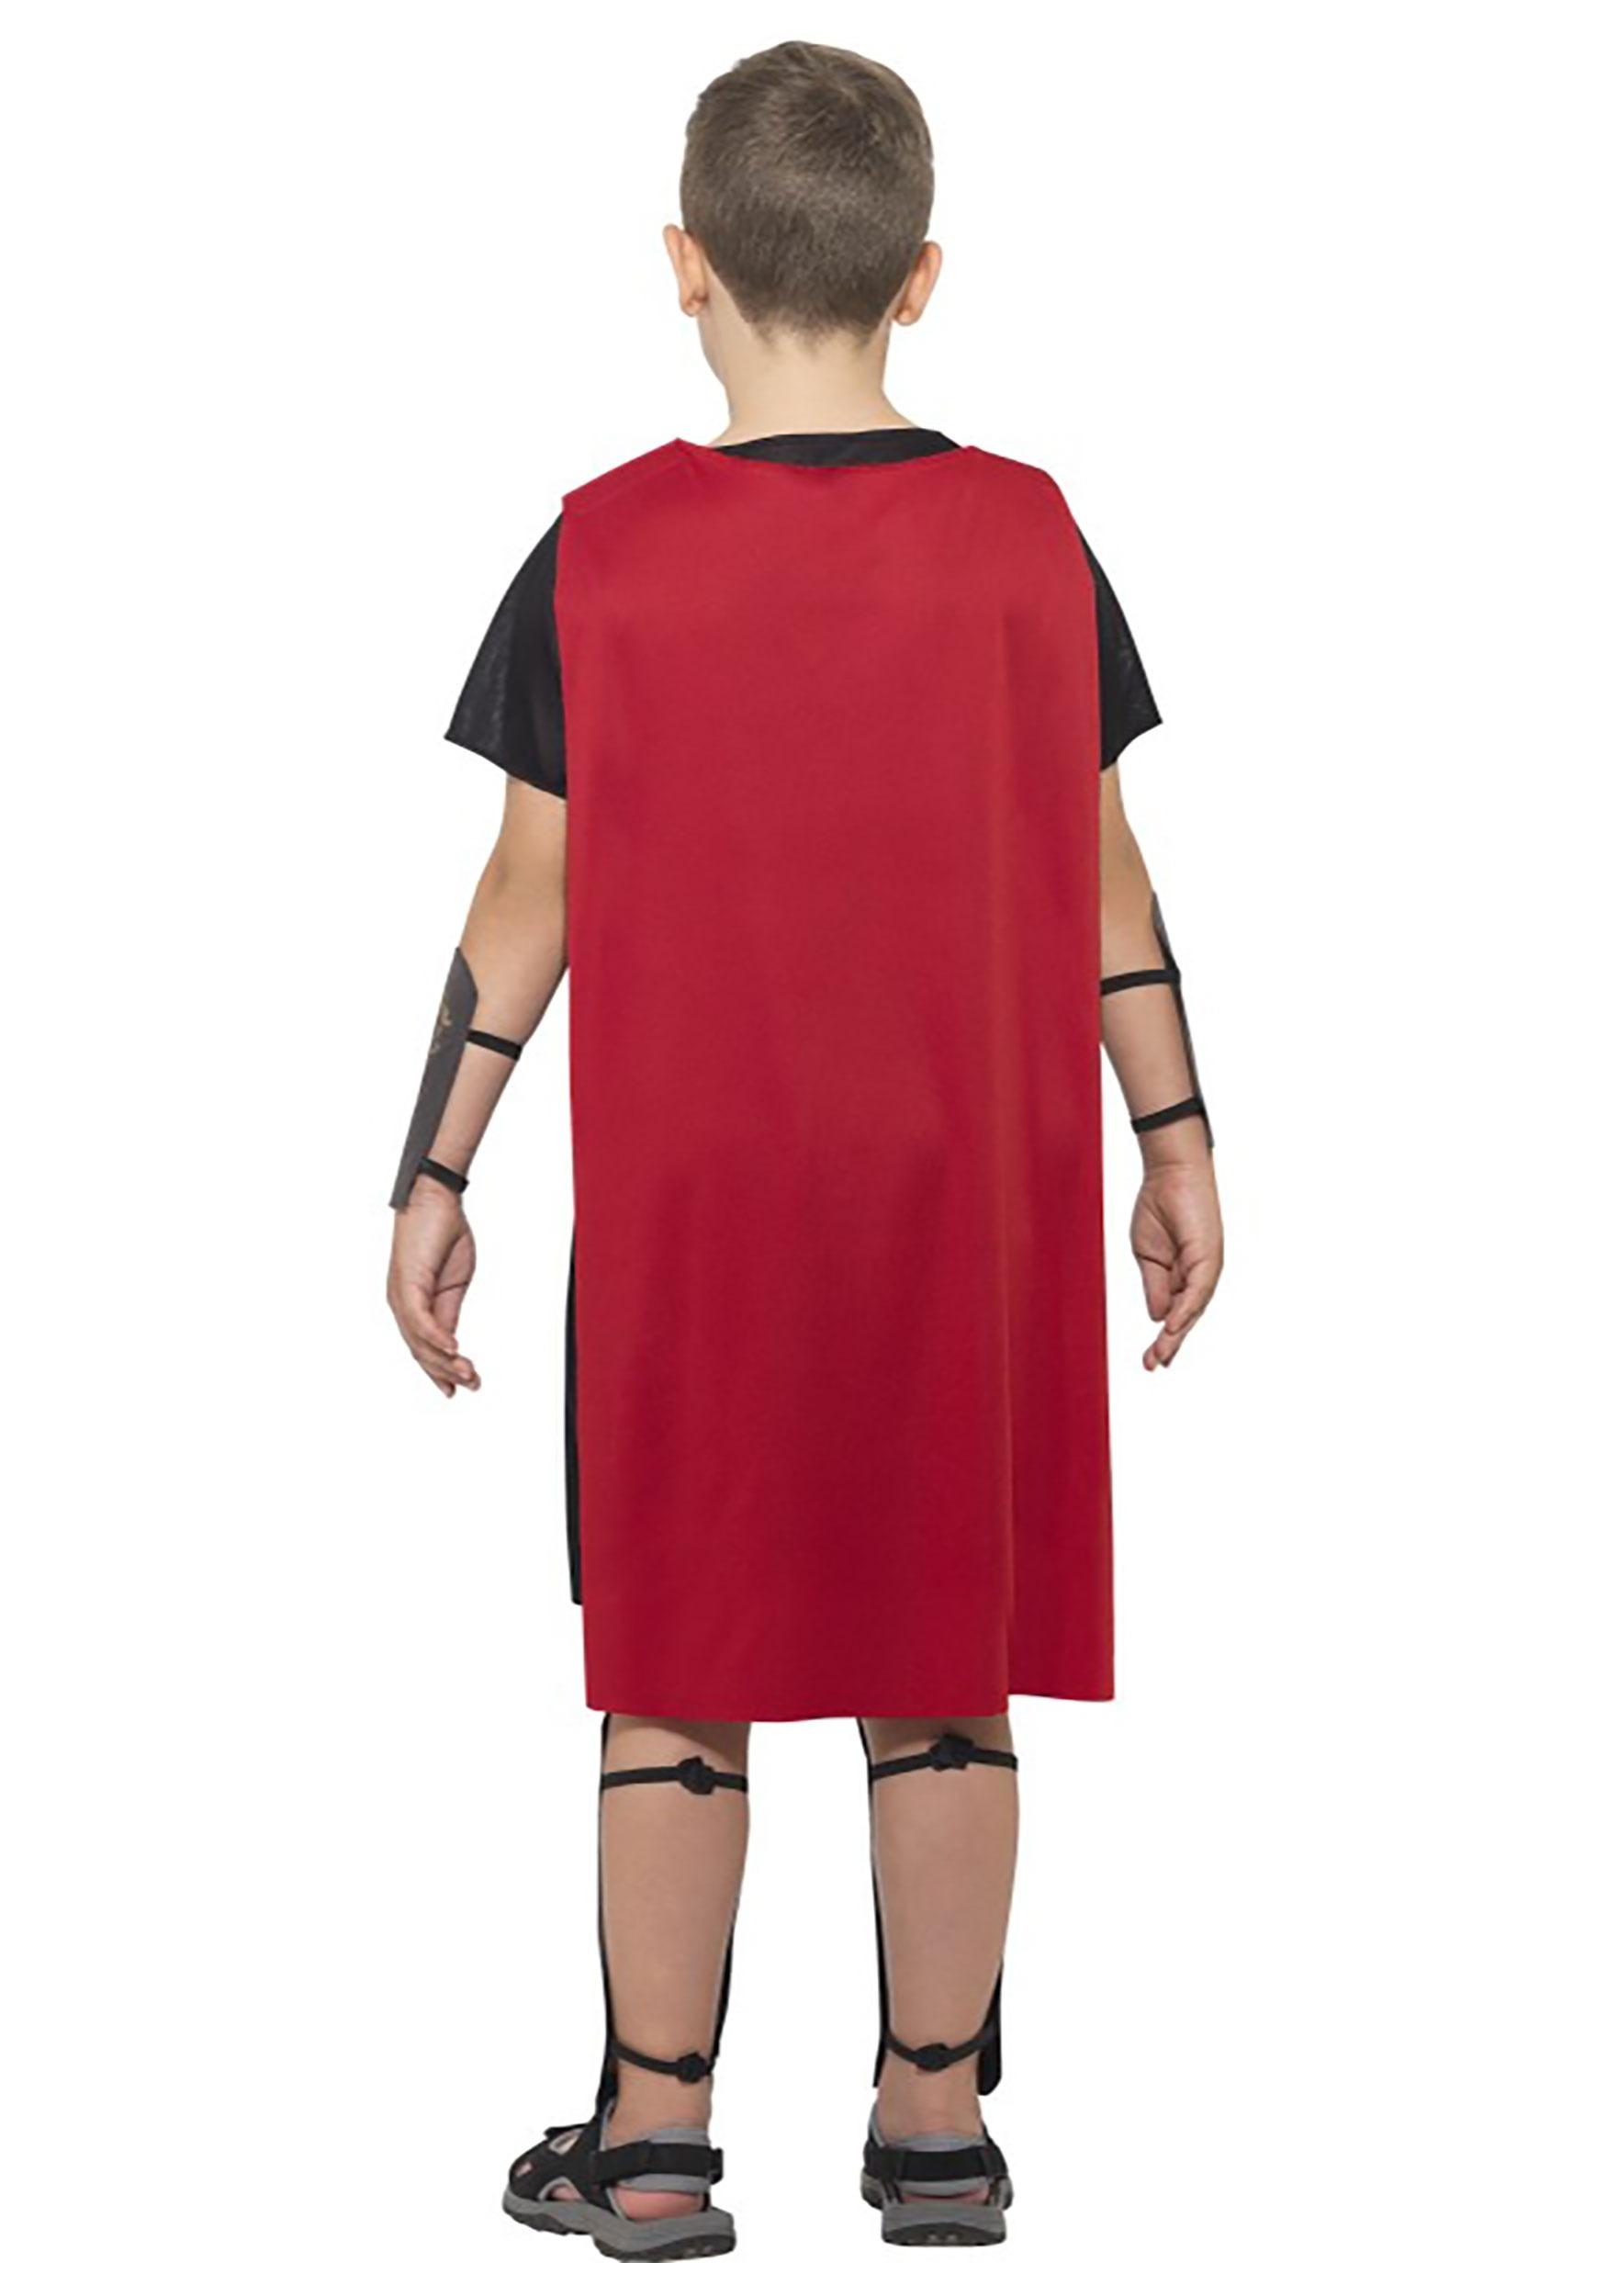 Boys Roman Soldier Costume Boys Roman Soldier Costume1  sc 1 st  Halloween Costumes & Roman Soldier Boys Costume